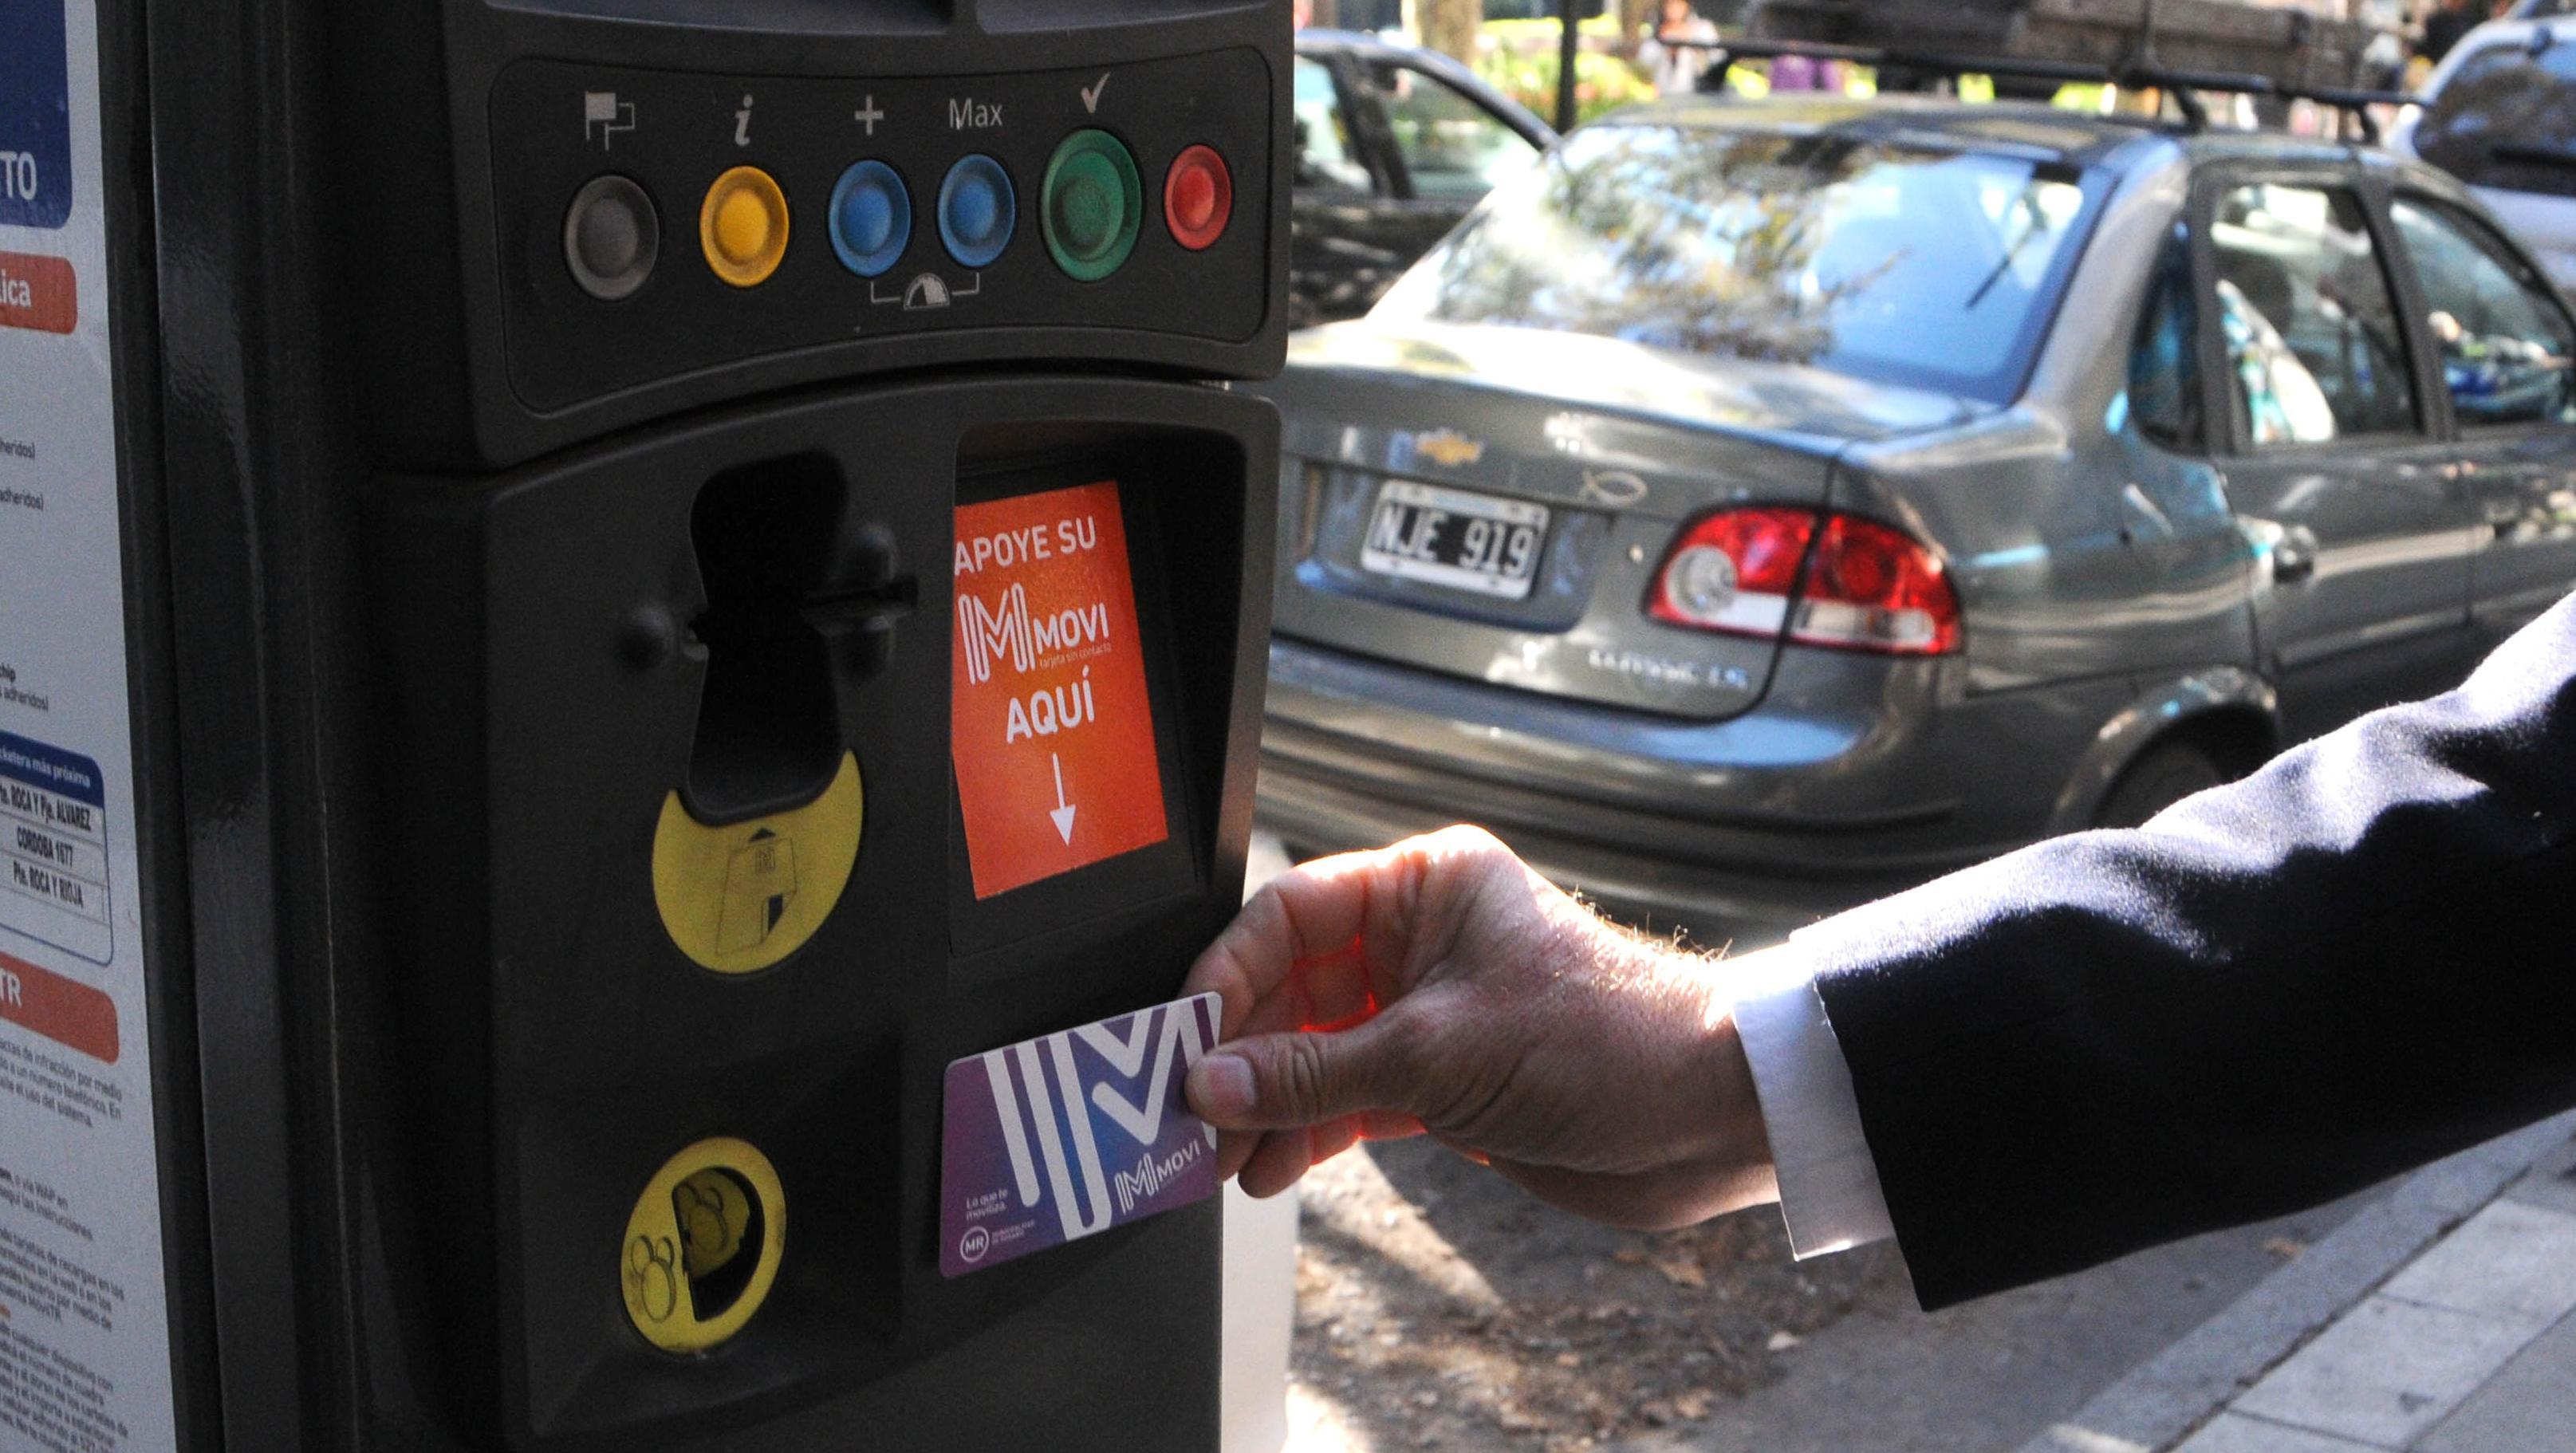 Aumento la tarifa del estacionamiento medido